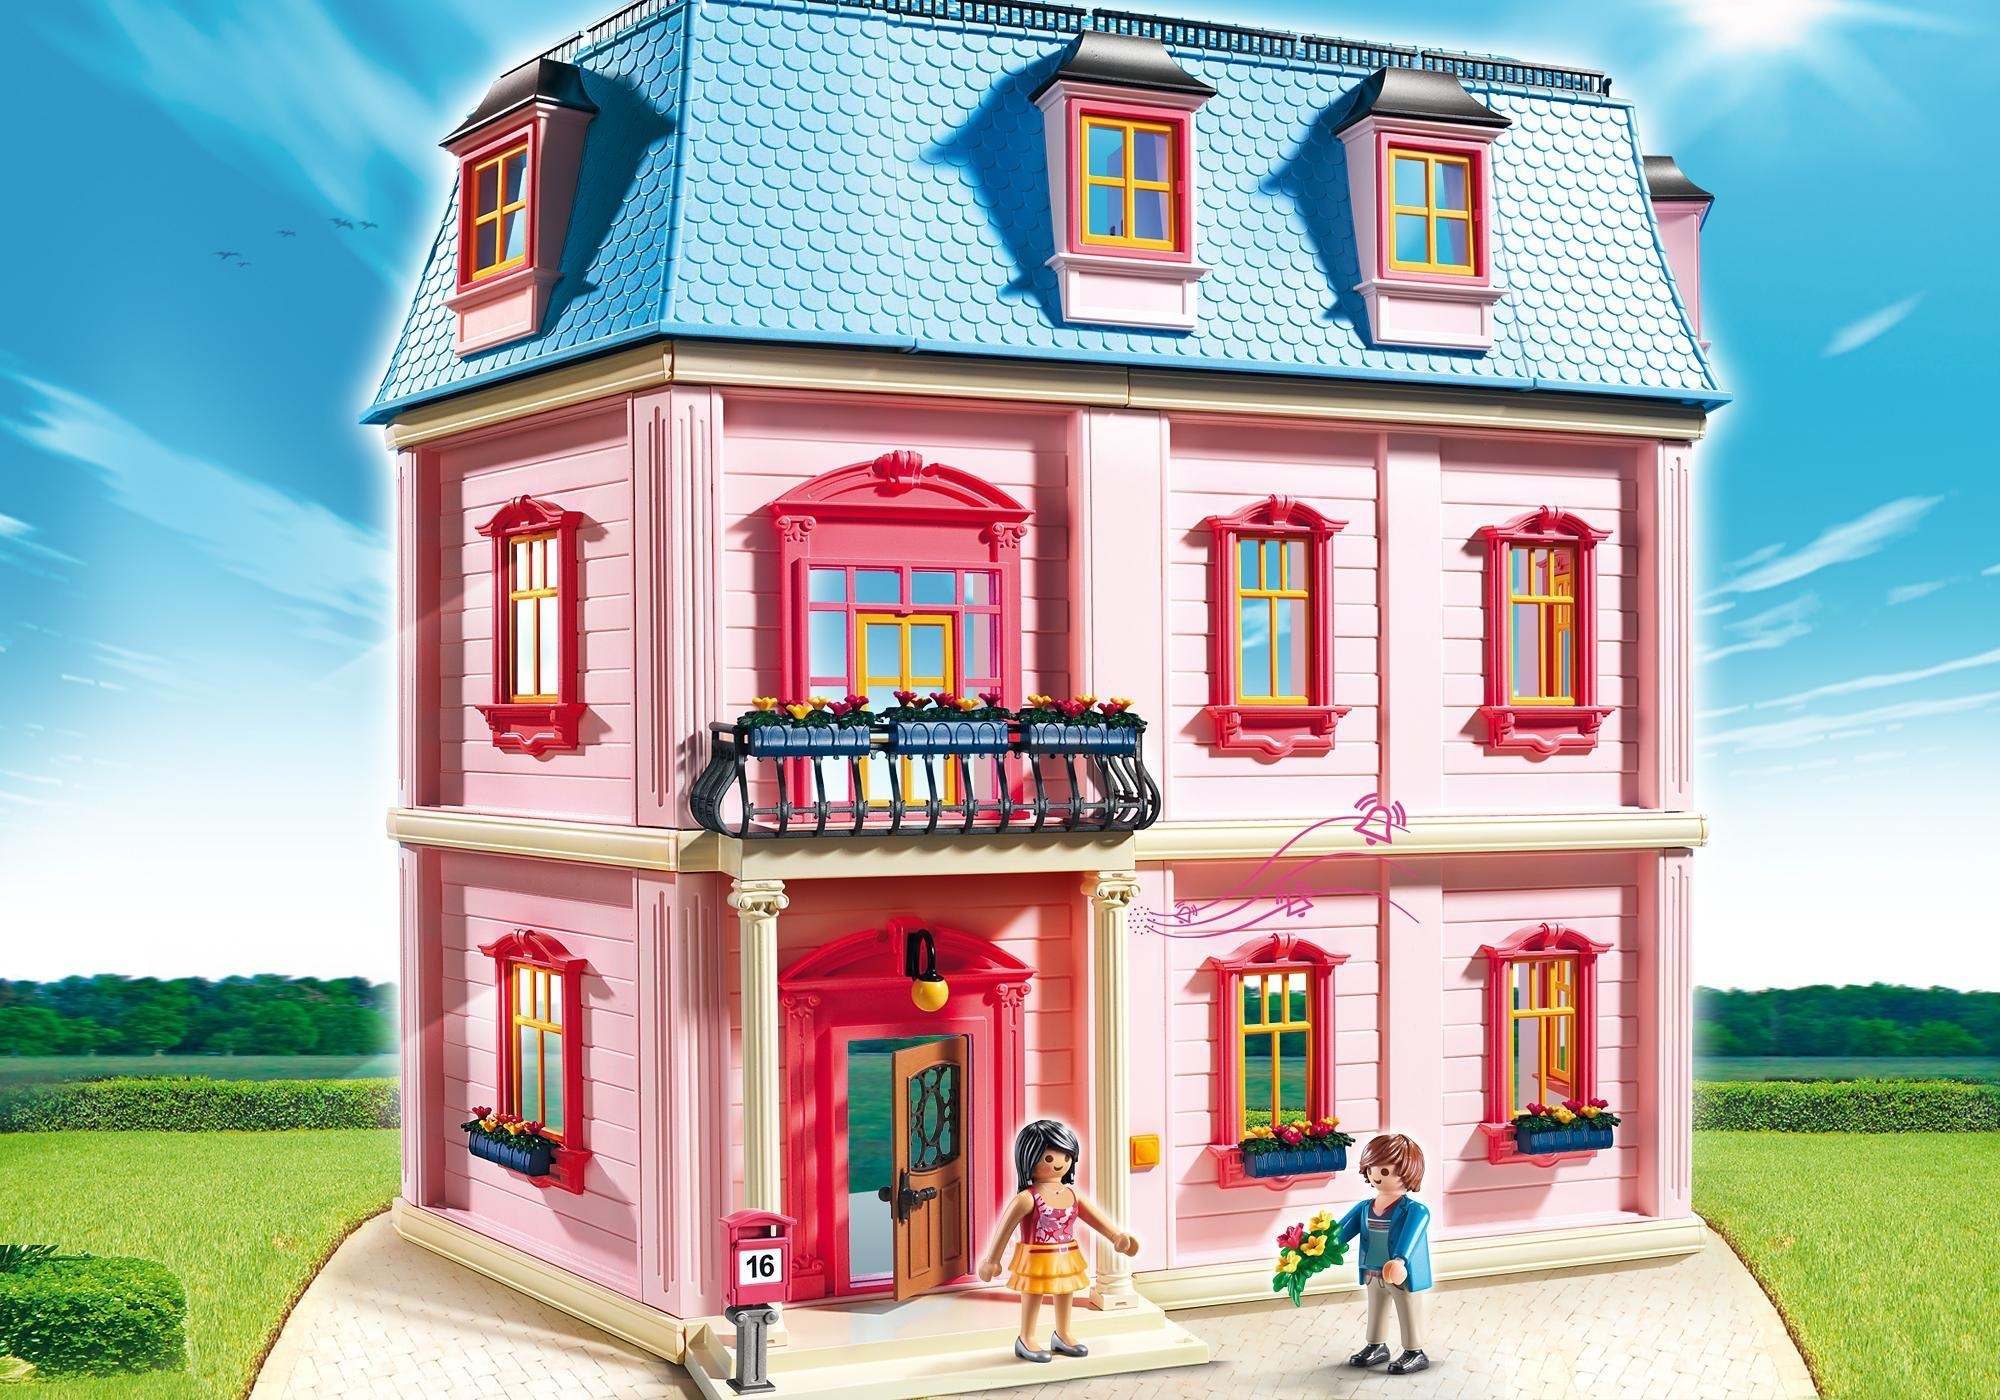 Playmobil puppenhaus haus 5303 internet toys - Playmobil haus schlafzimmer ...